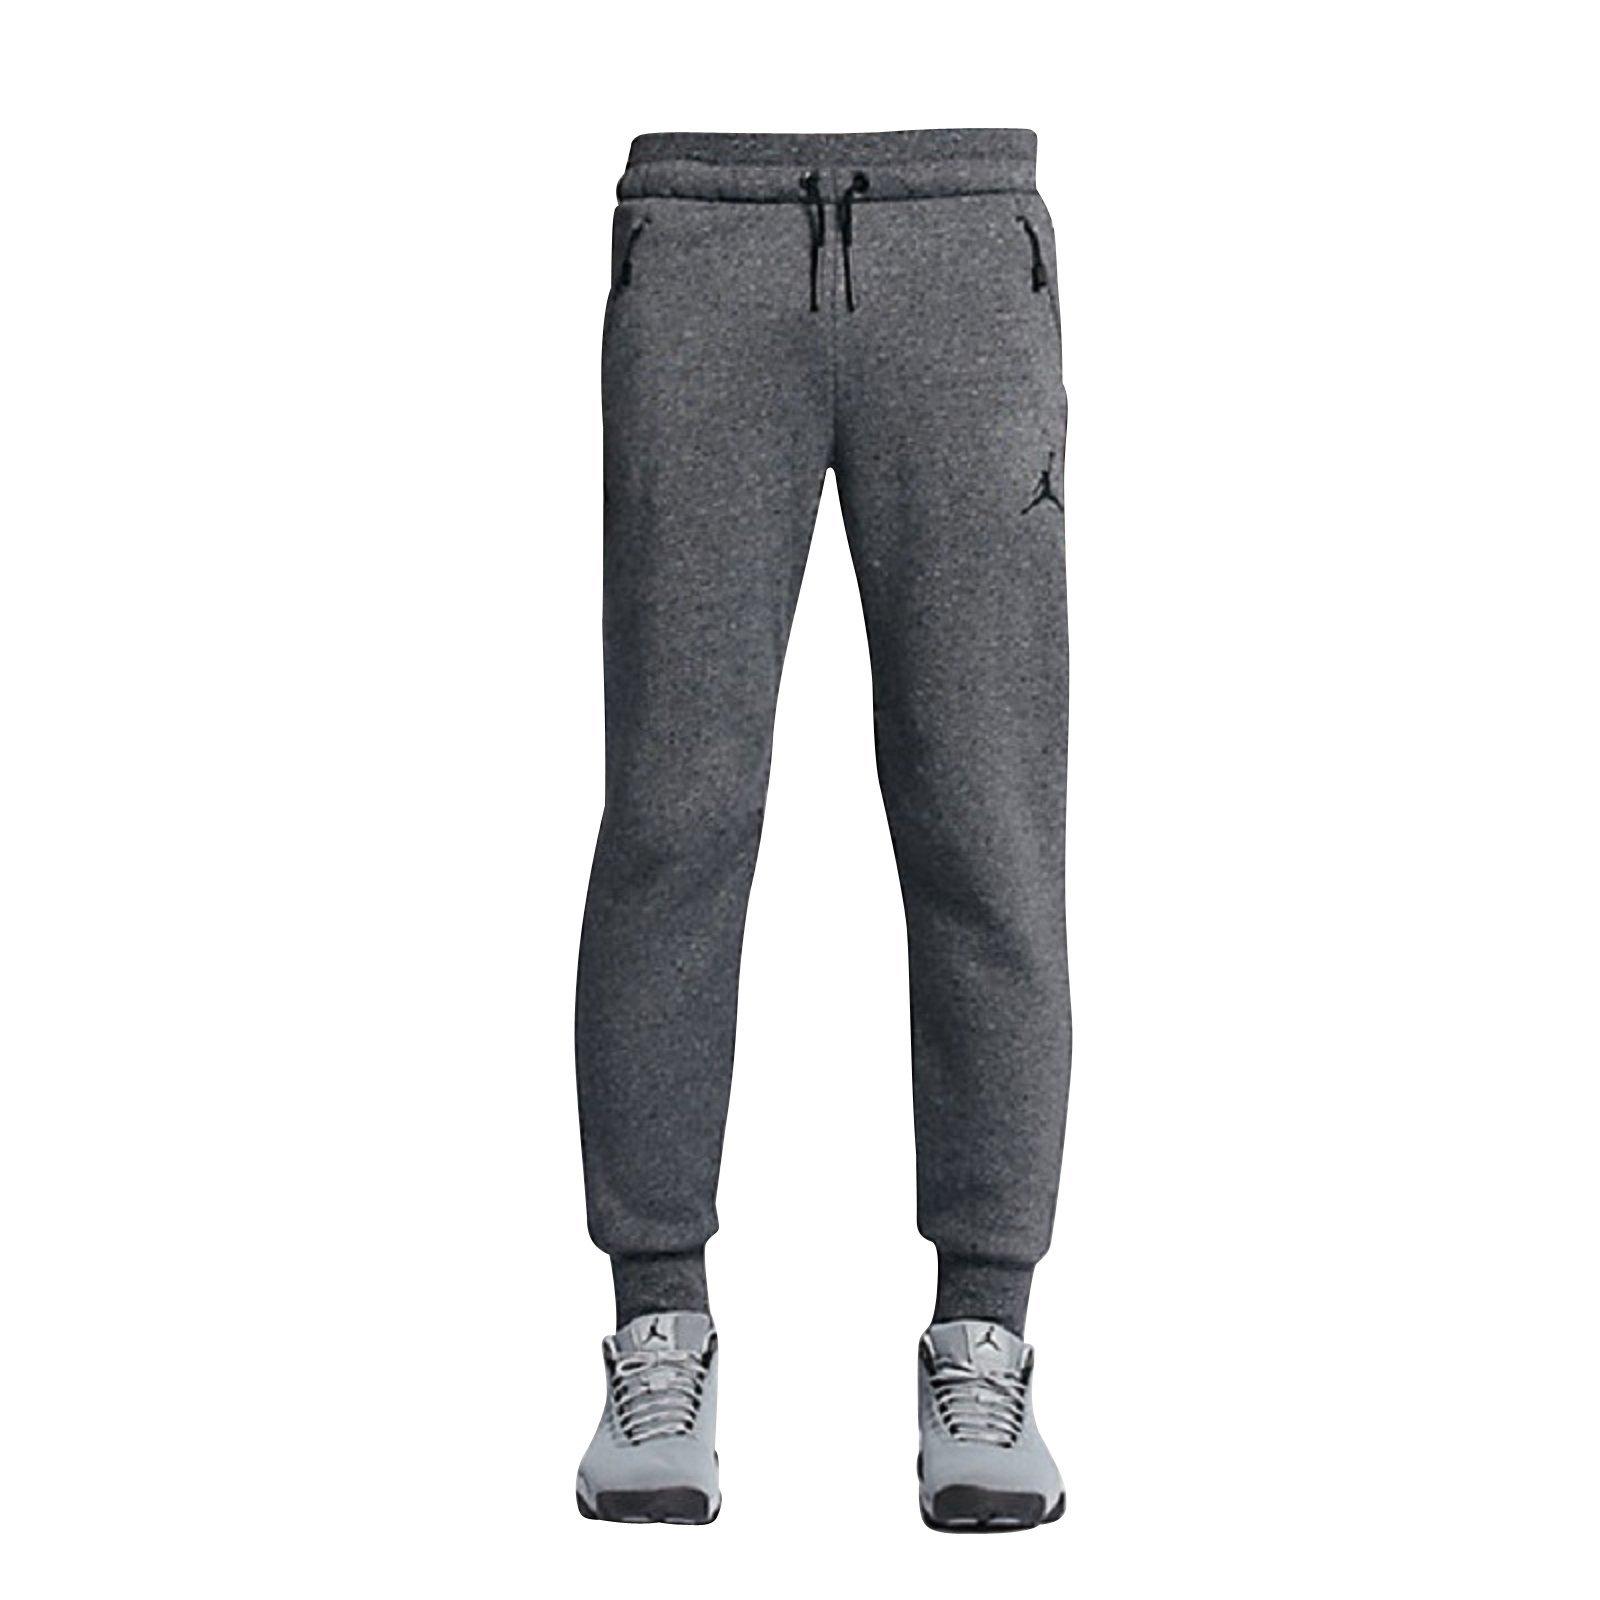 Nike Mens Jordan Icon Fleece Cuffed Sweatpants Dark Grey Black 809472-010 Size Small by Jordan